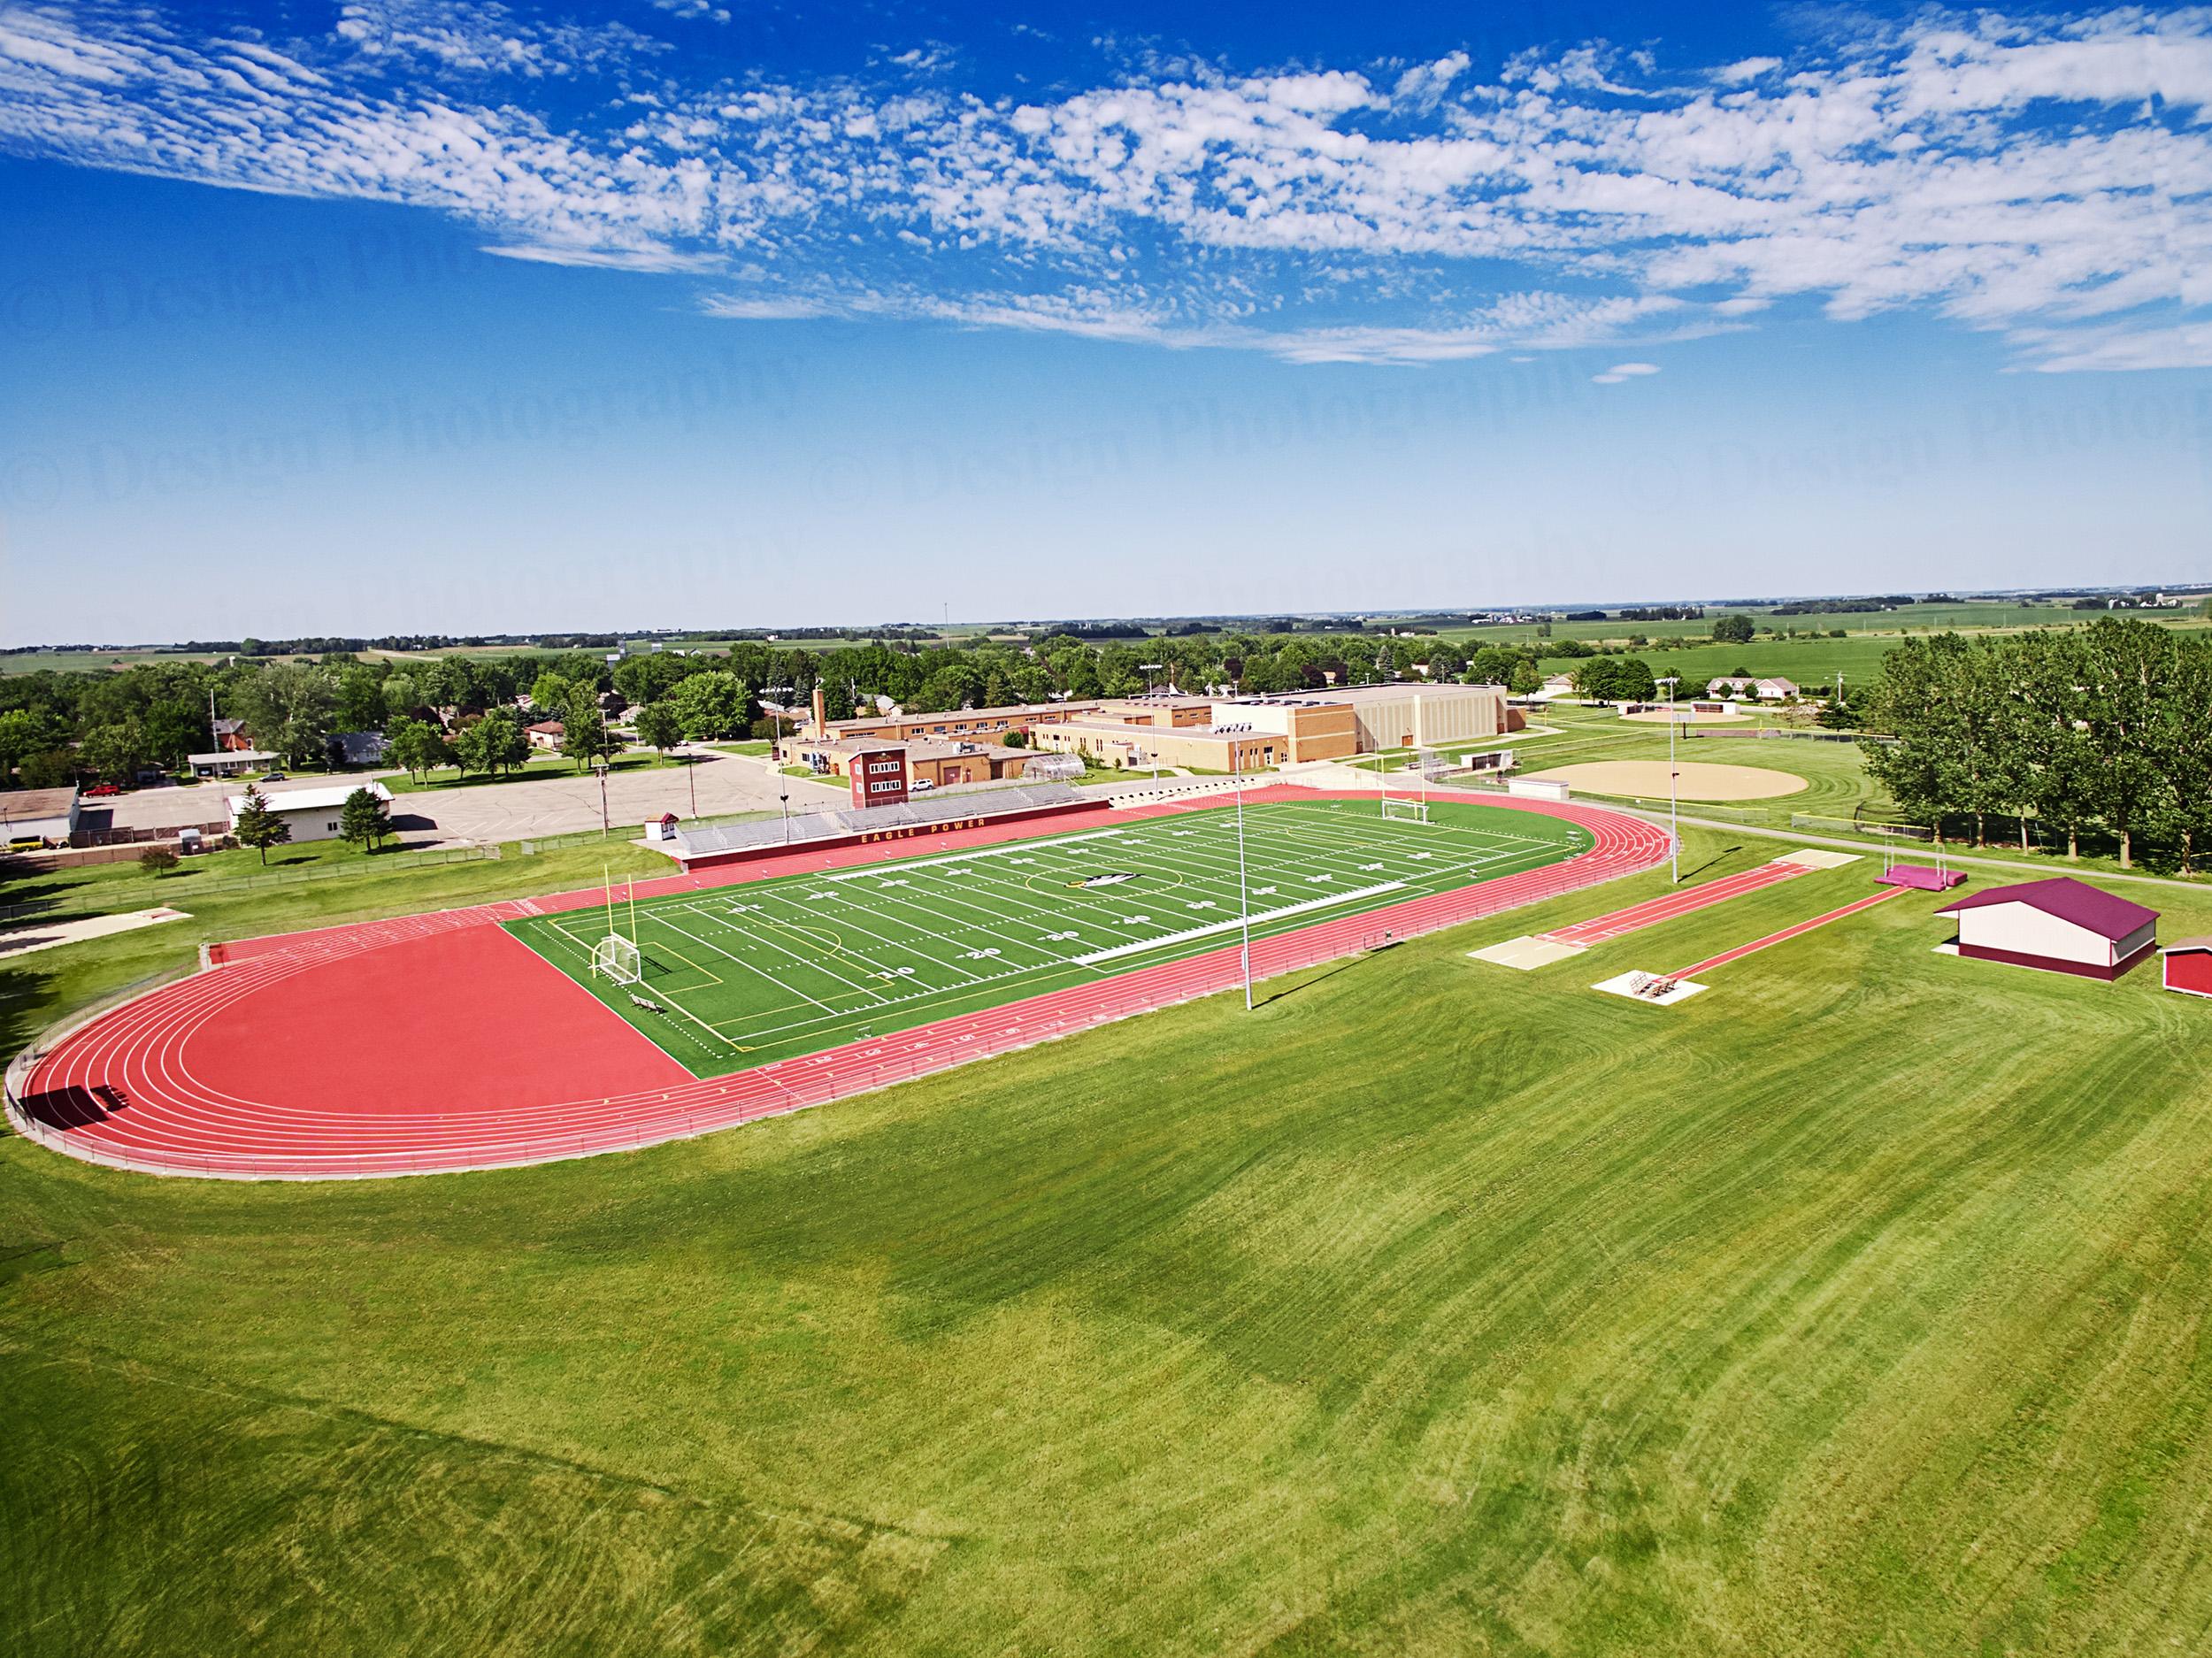 Aerial photograph of high school football field